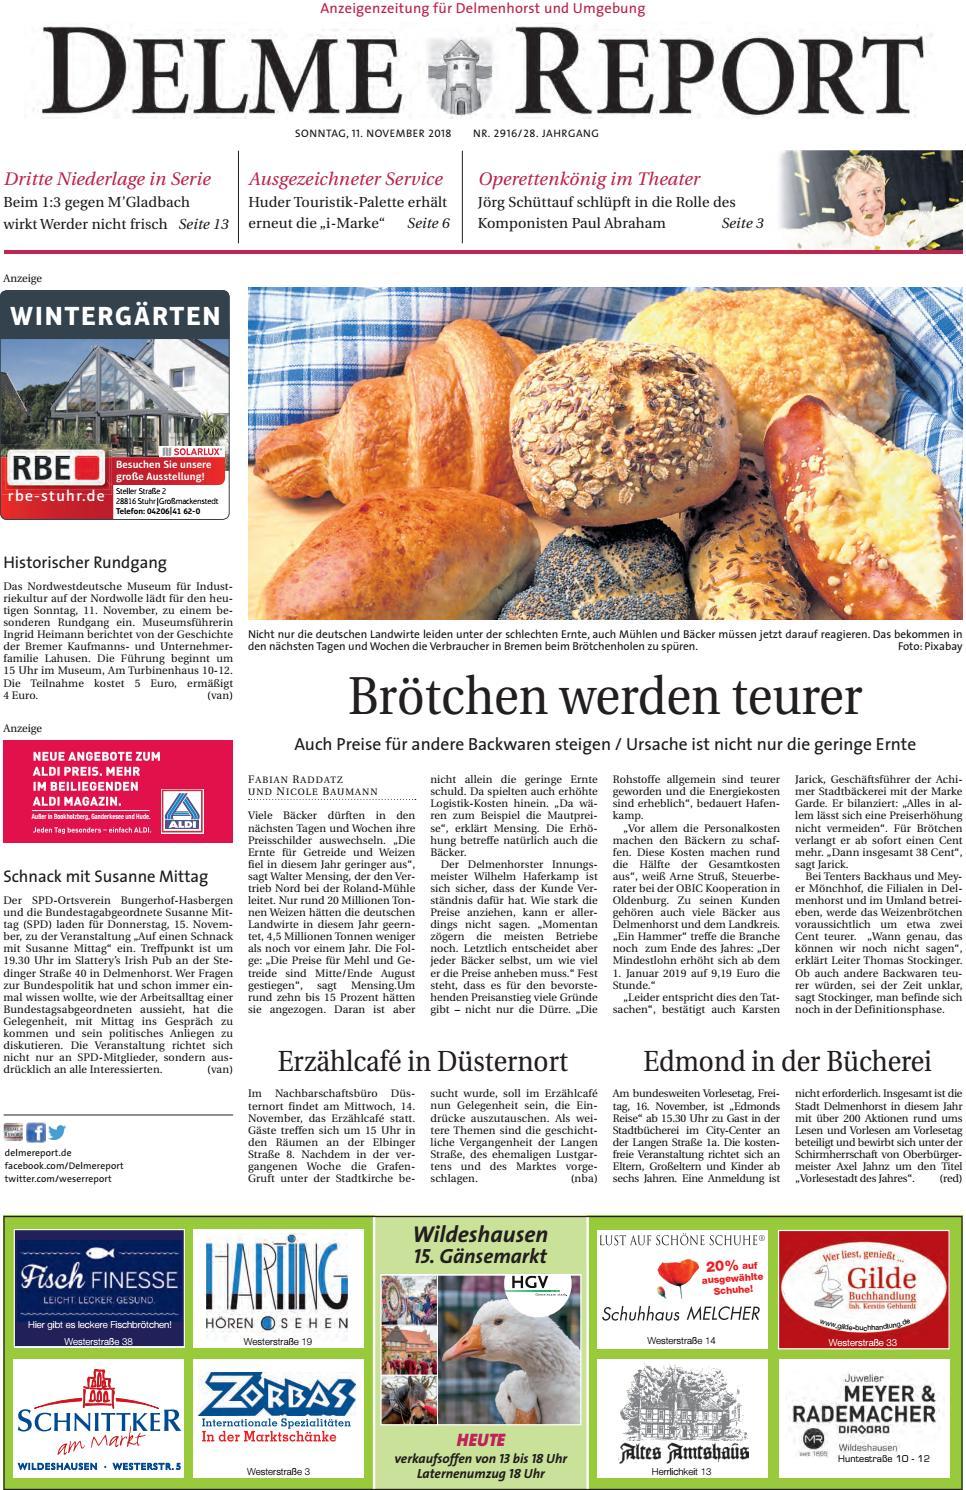 Delme Report vom 11.11.2018 by KPS Verlagsgesellschaft mbH - issuu